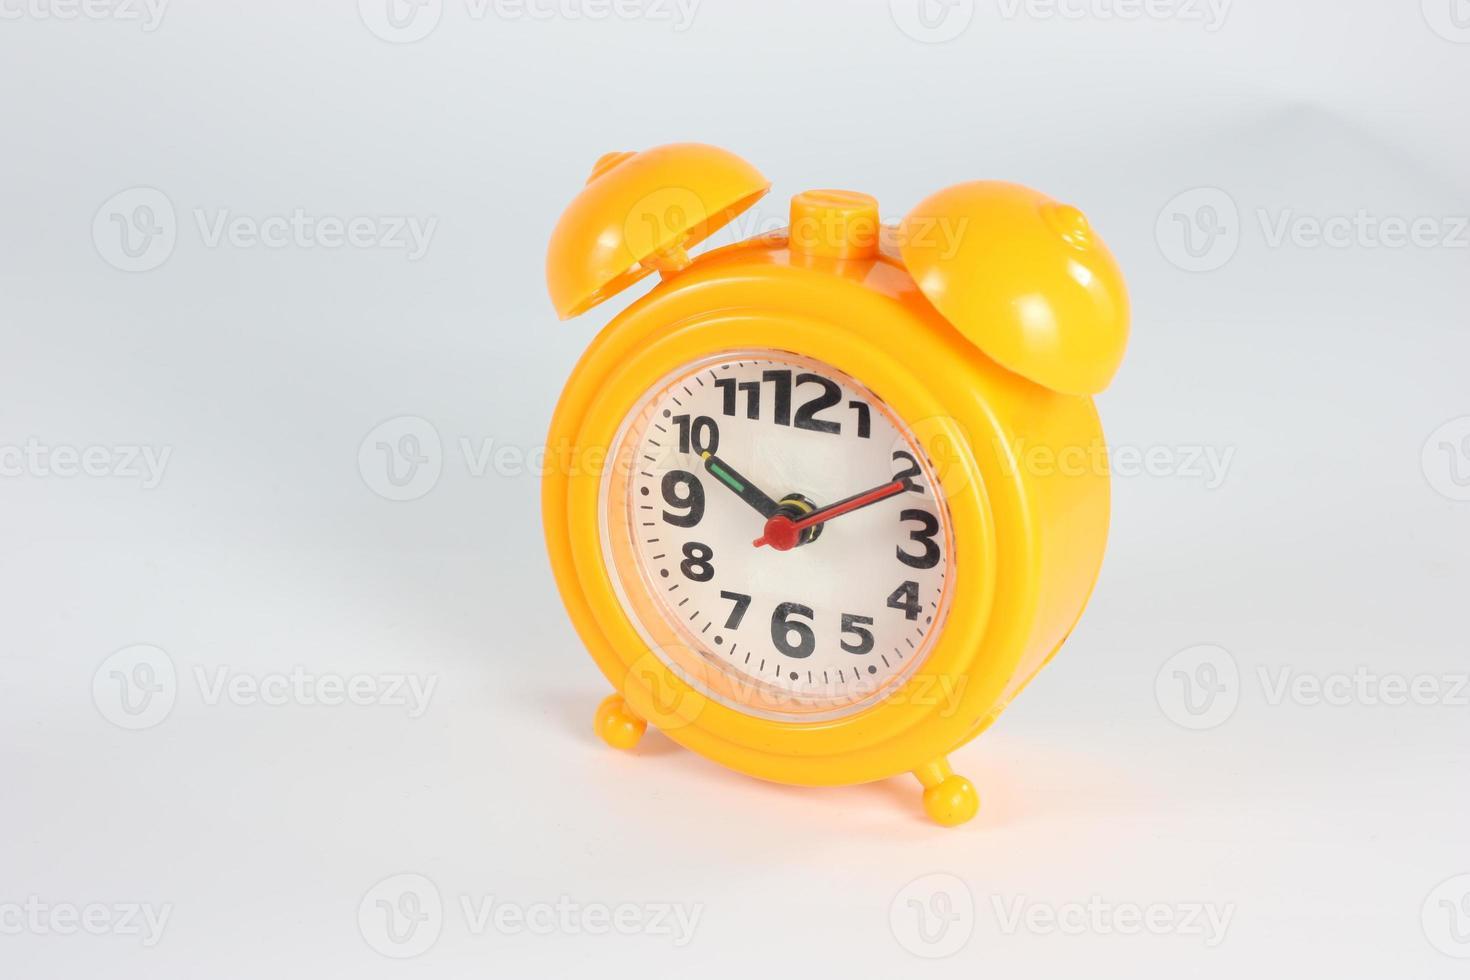 horloge jaune sur fond blanc photo